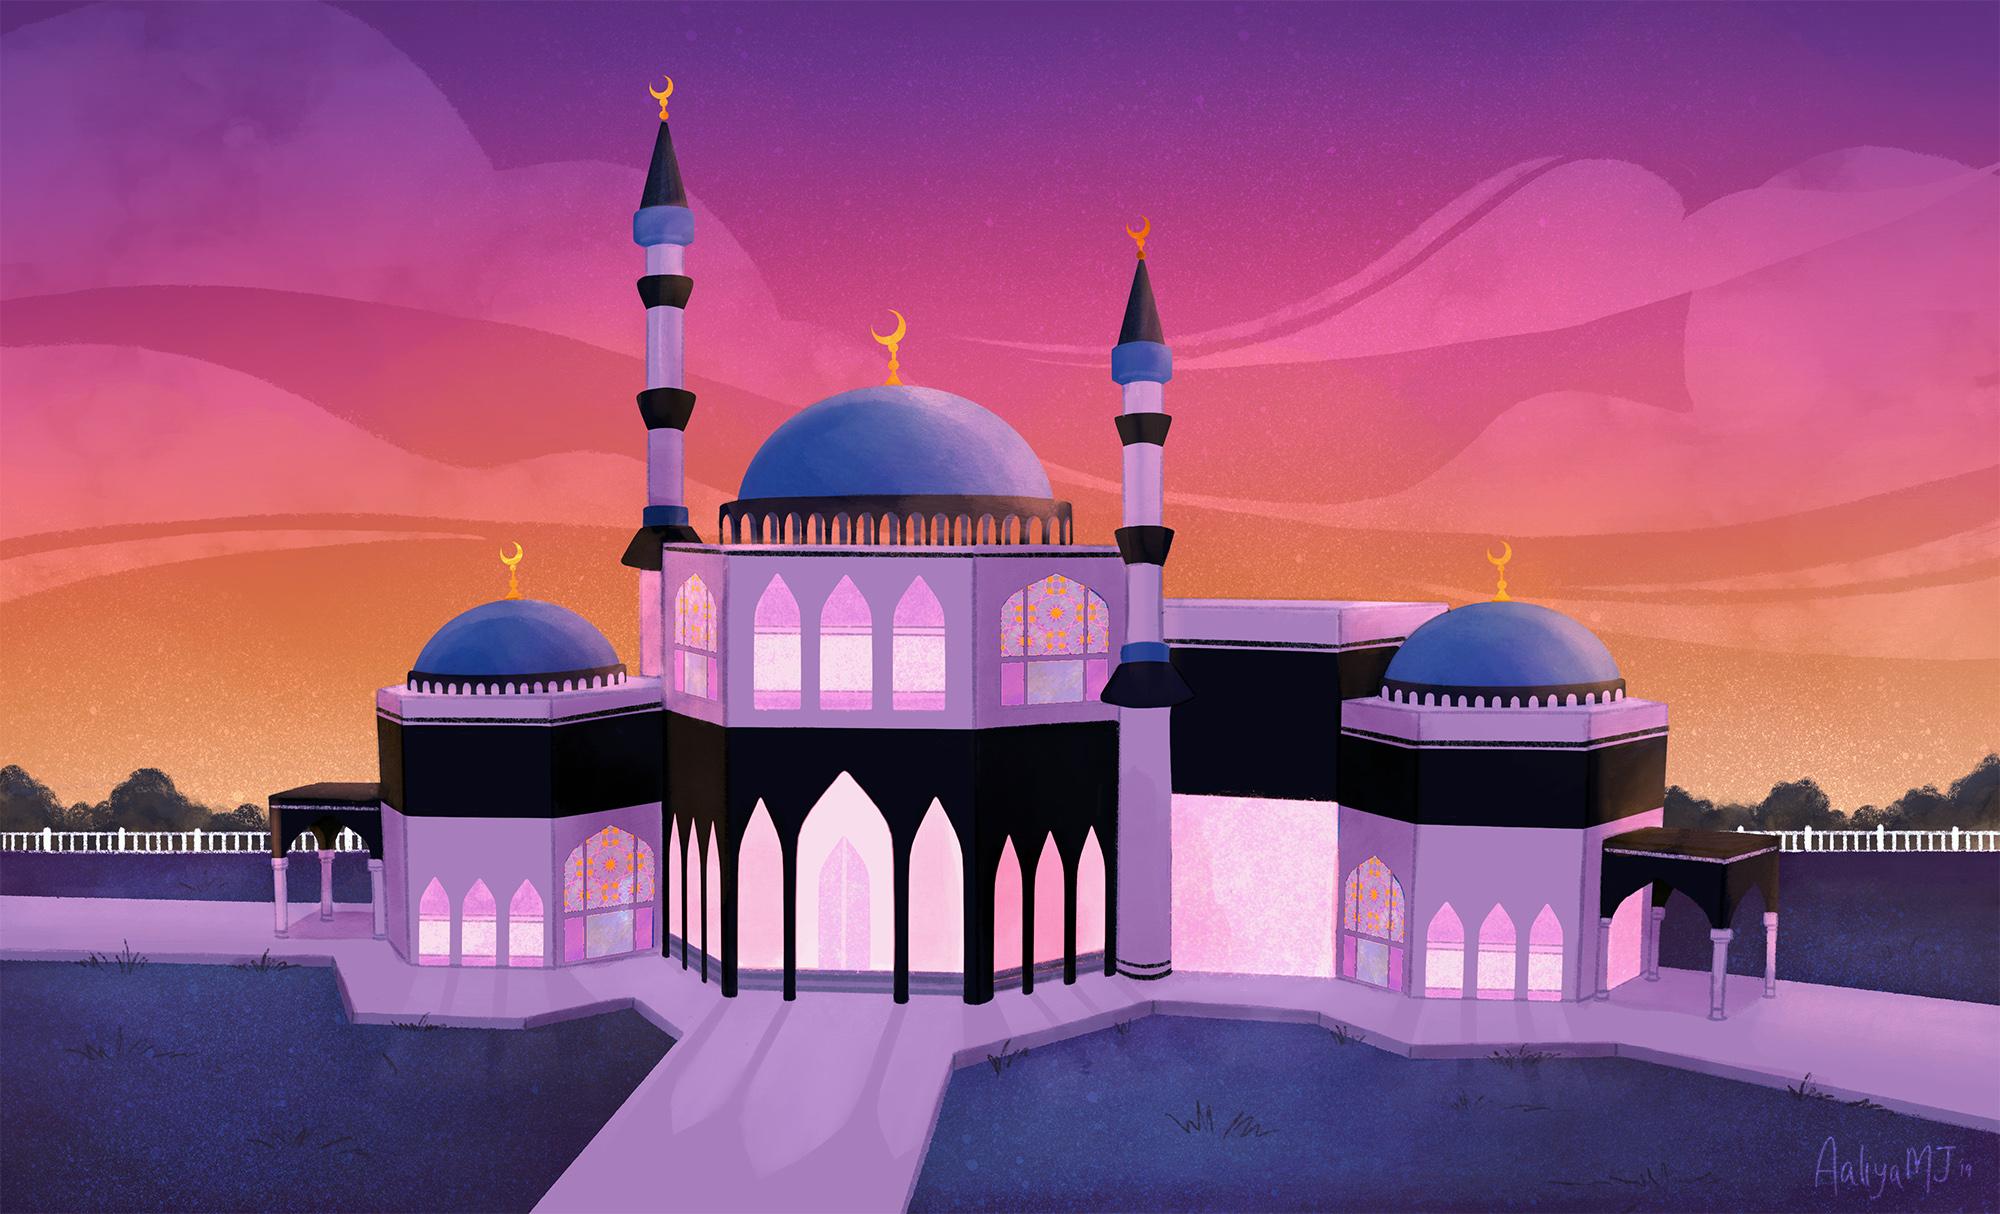 The_Masjid_Sunset.jpg